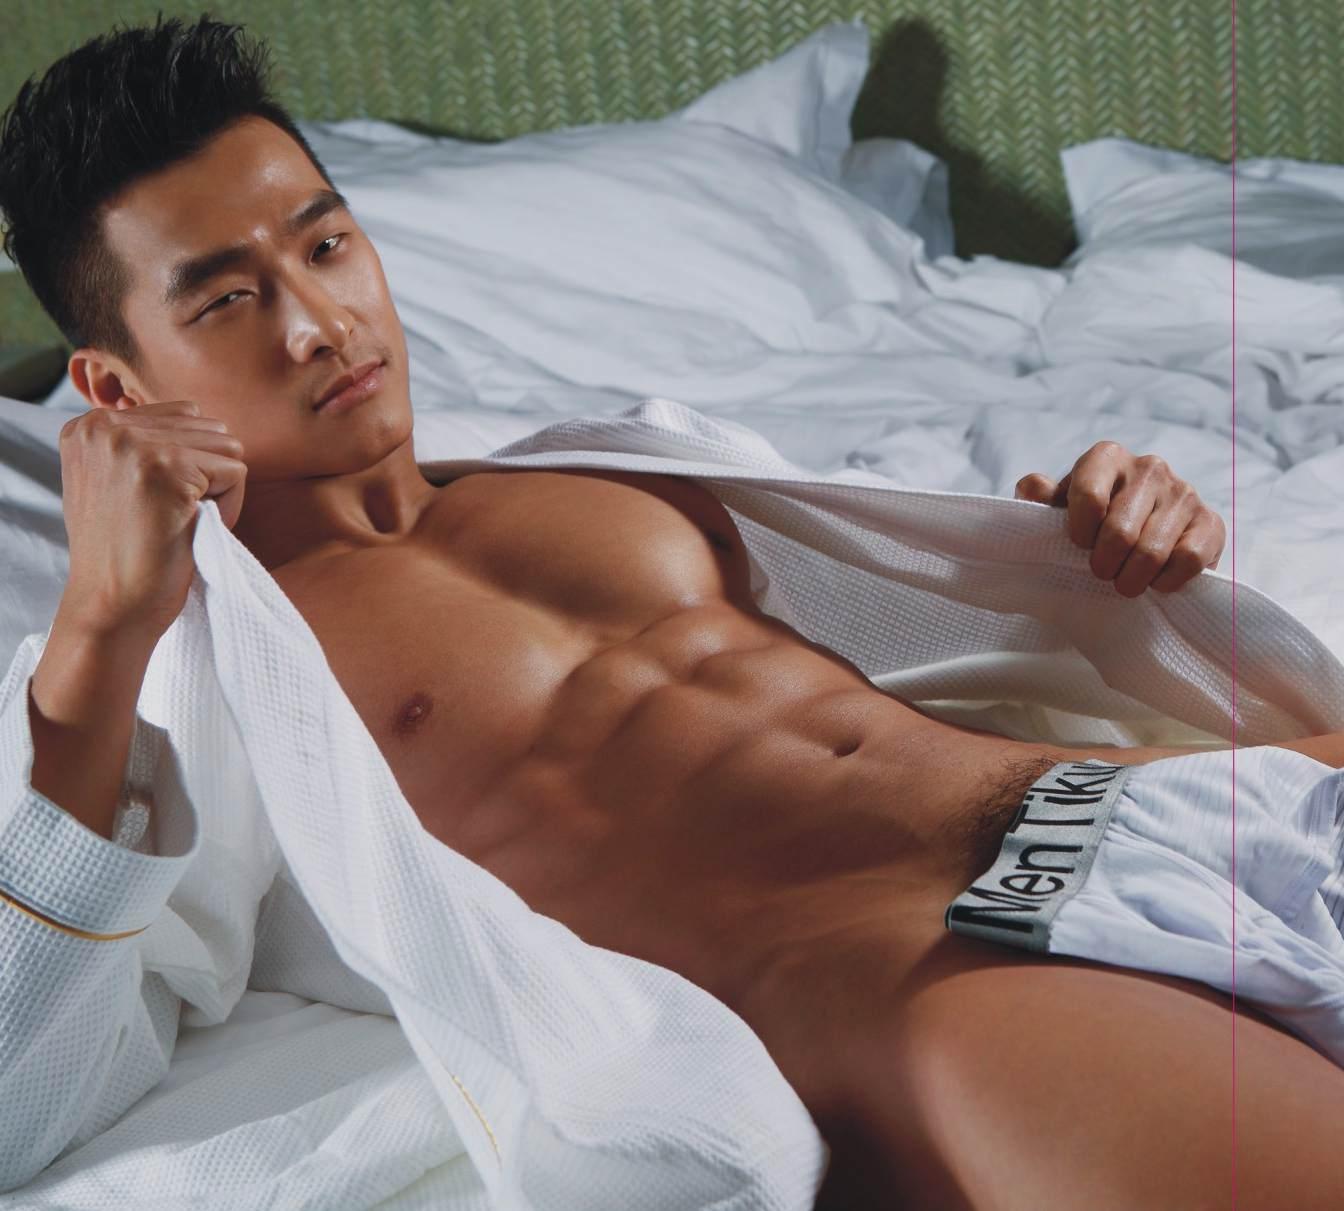 Free erotic korean male underwear models girls naked